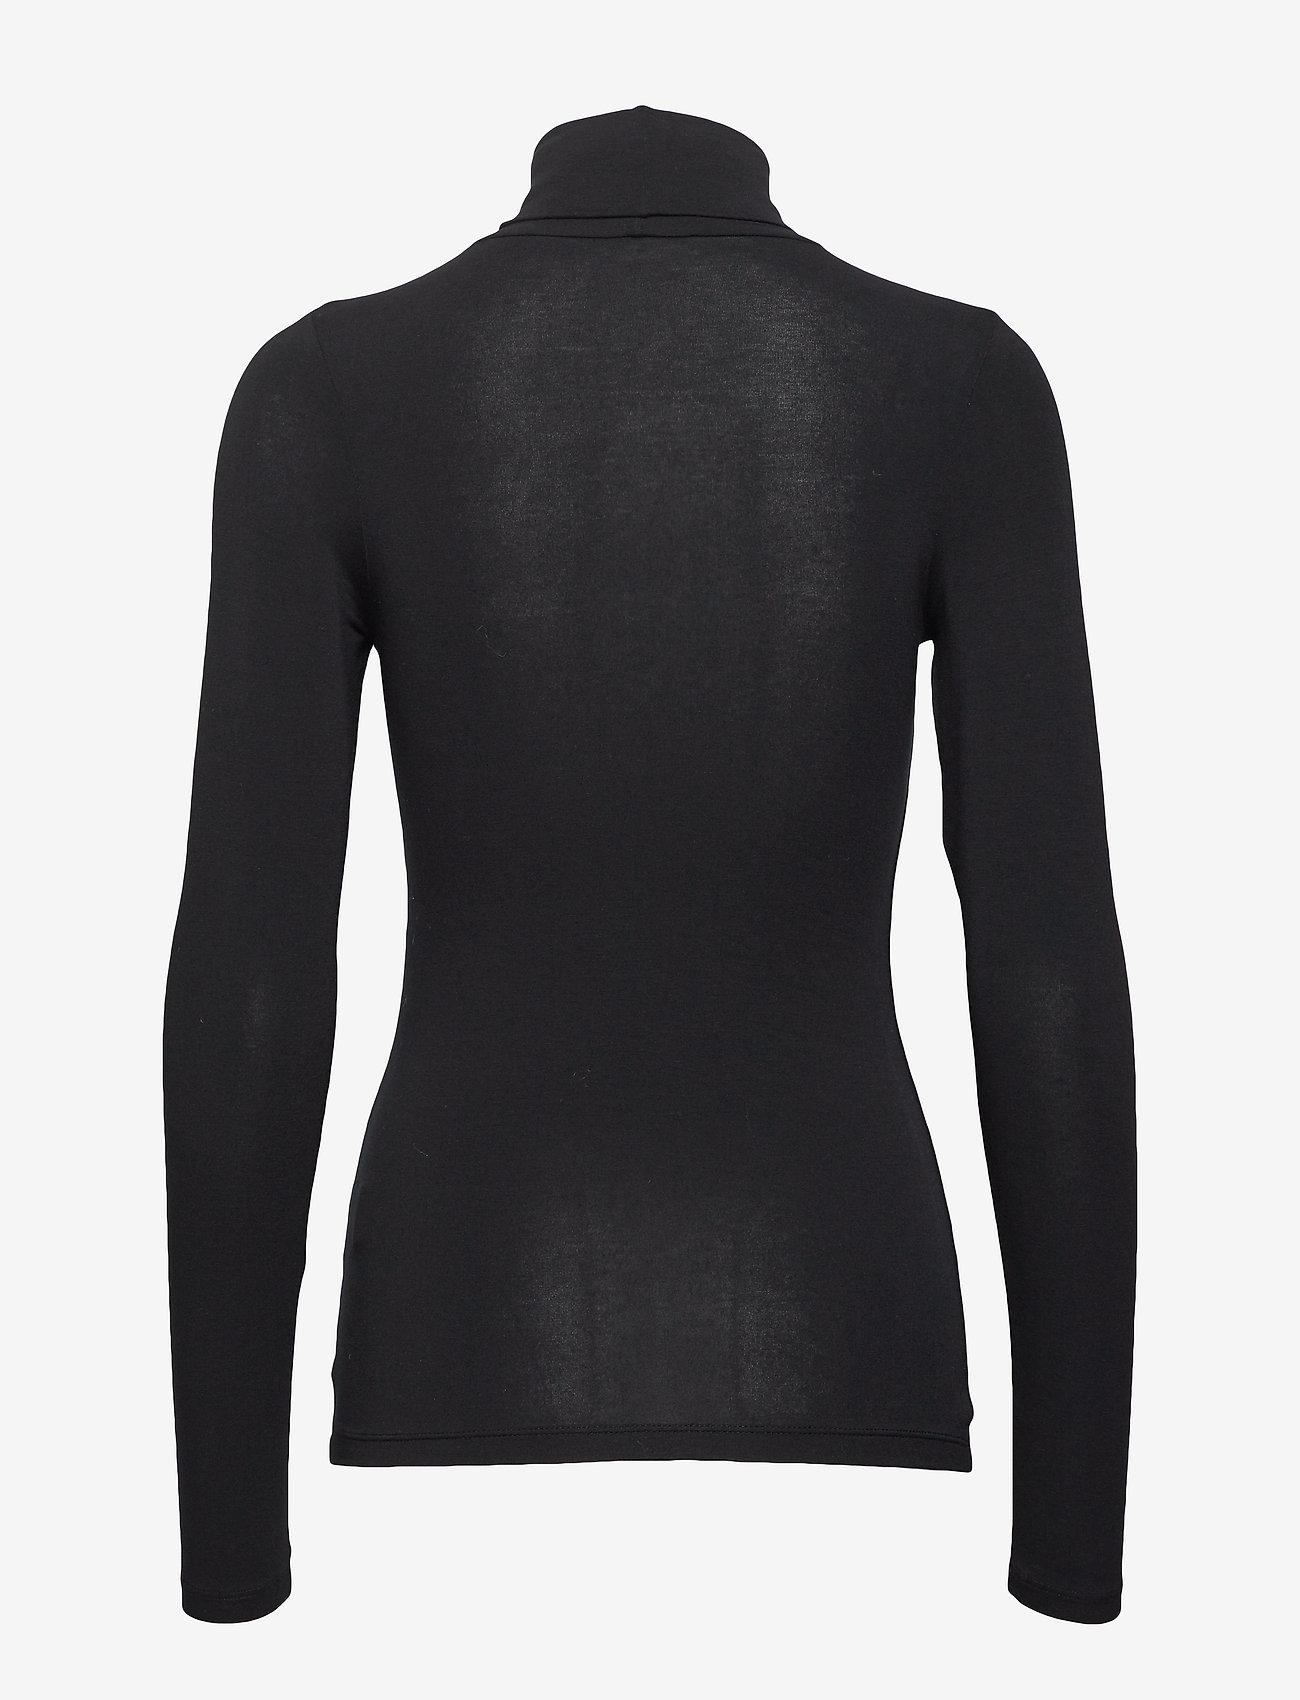 mbyM - Ina - long-sleeved tops - black - 1